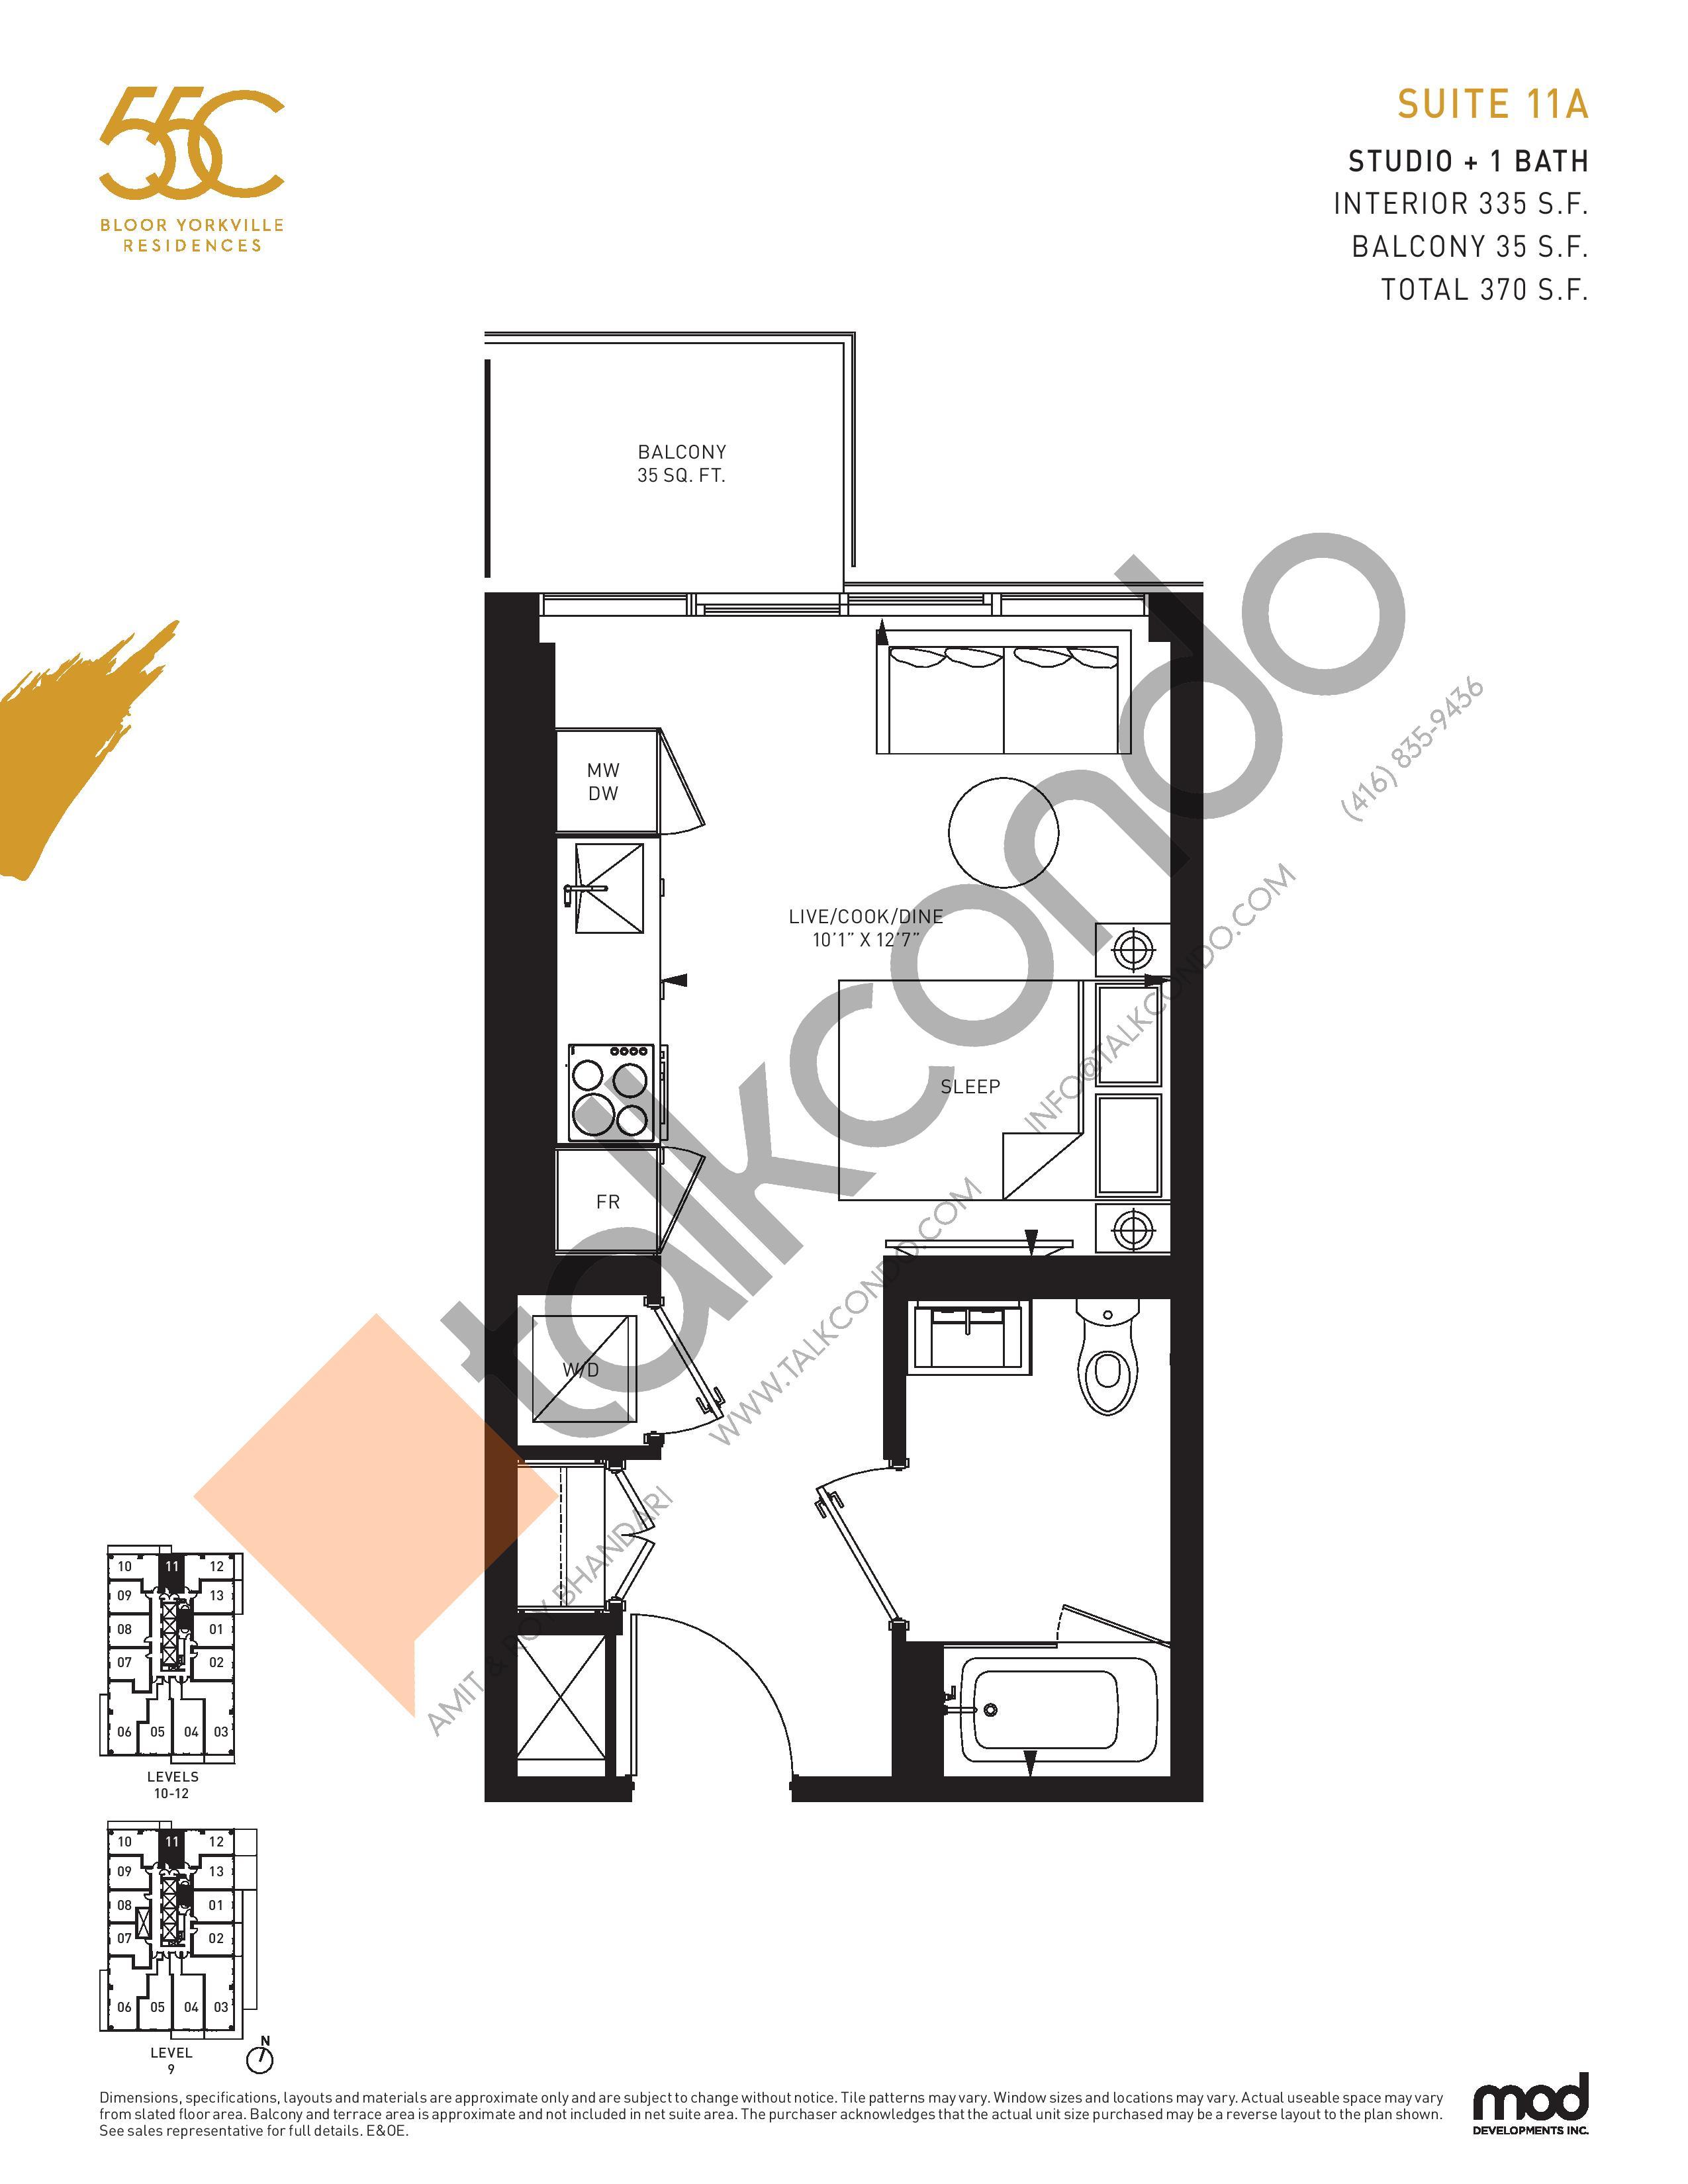 Suite 11A Floor Plan at 55C Condos - 335 sq.ft